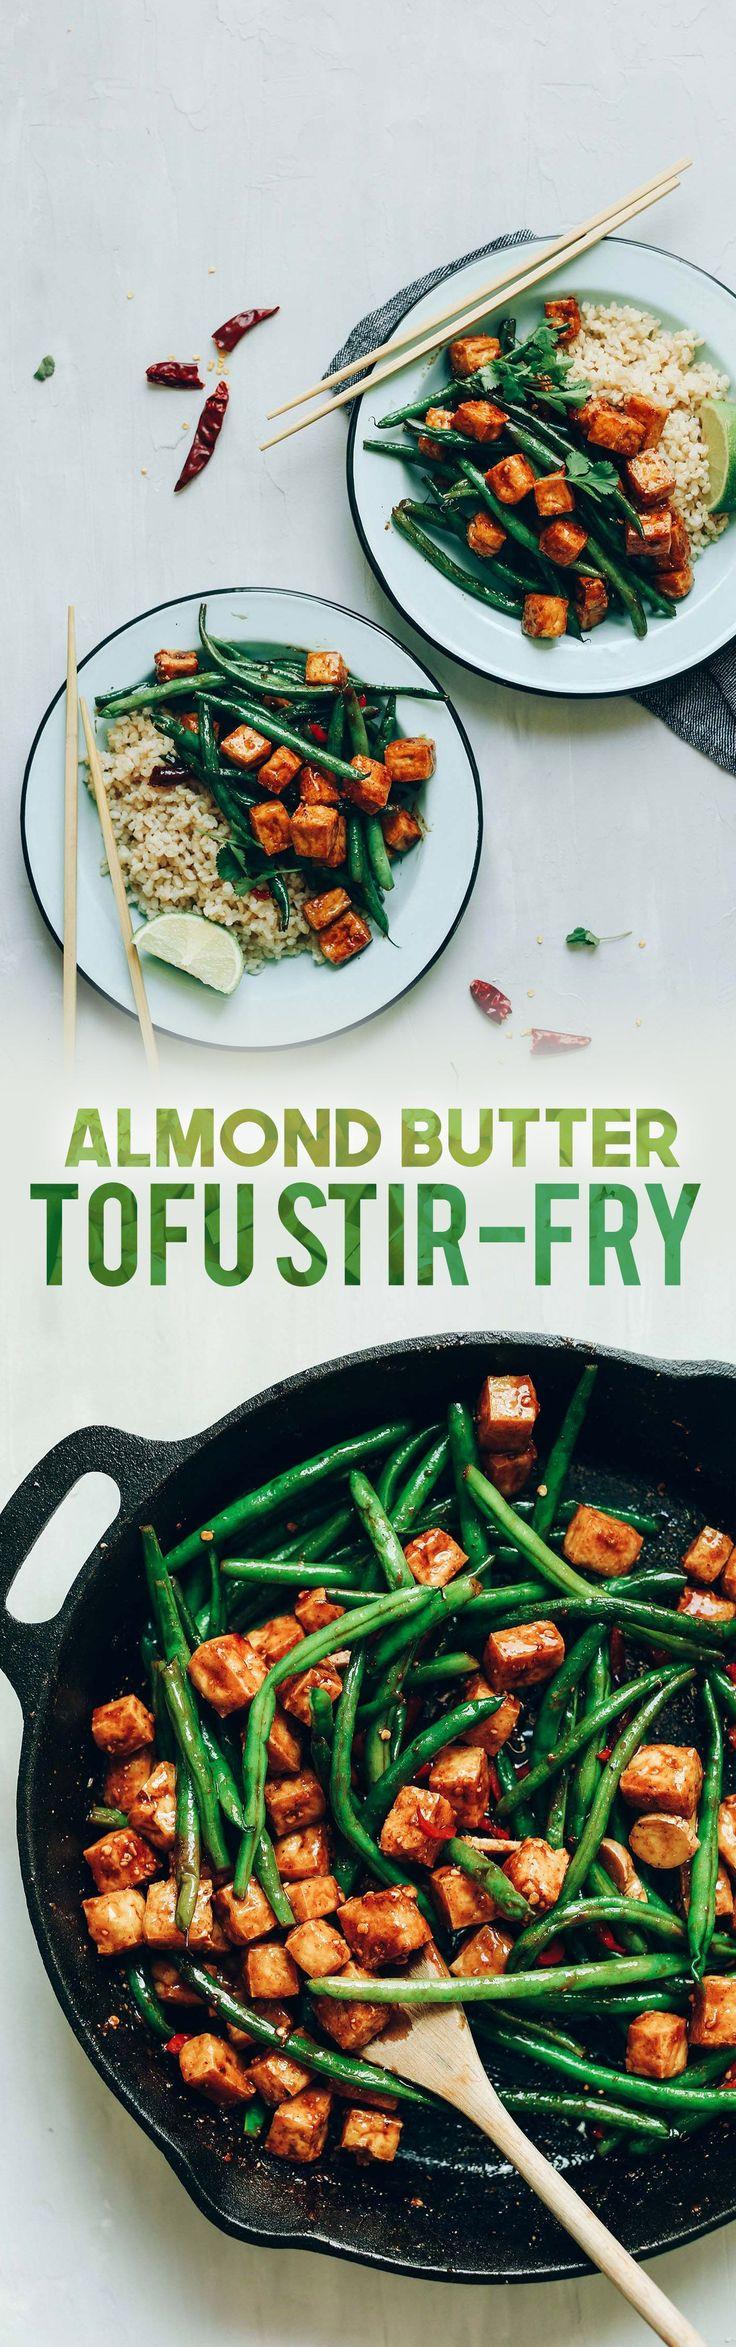 Almond Butter Tofu Stir-Fry! Healthy, 9 ingredients, fast, protein-rich!